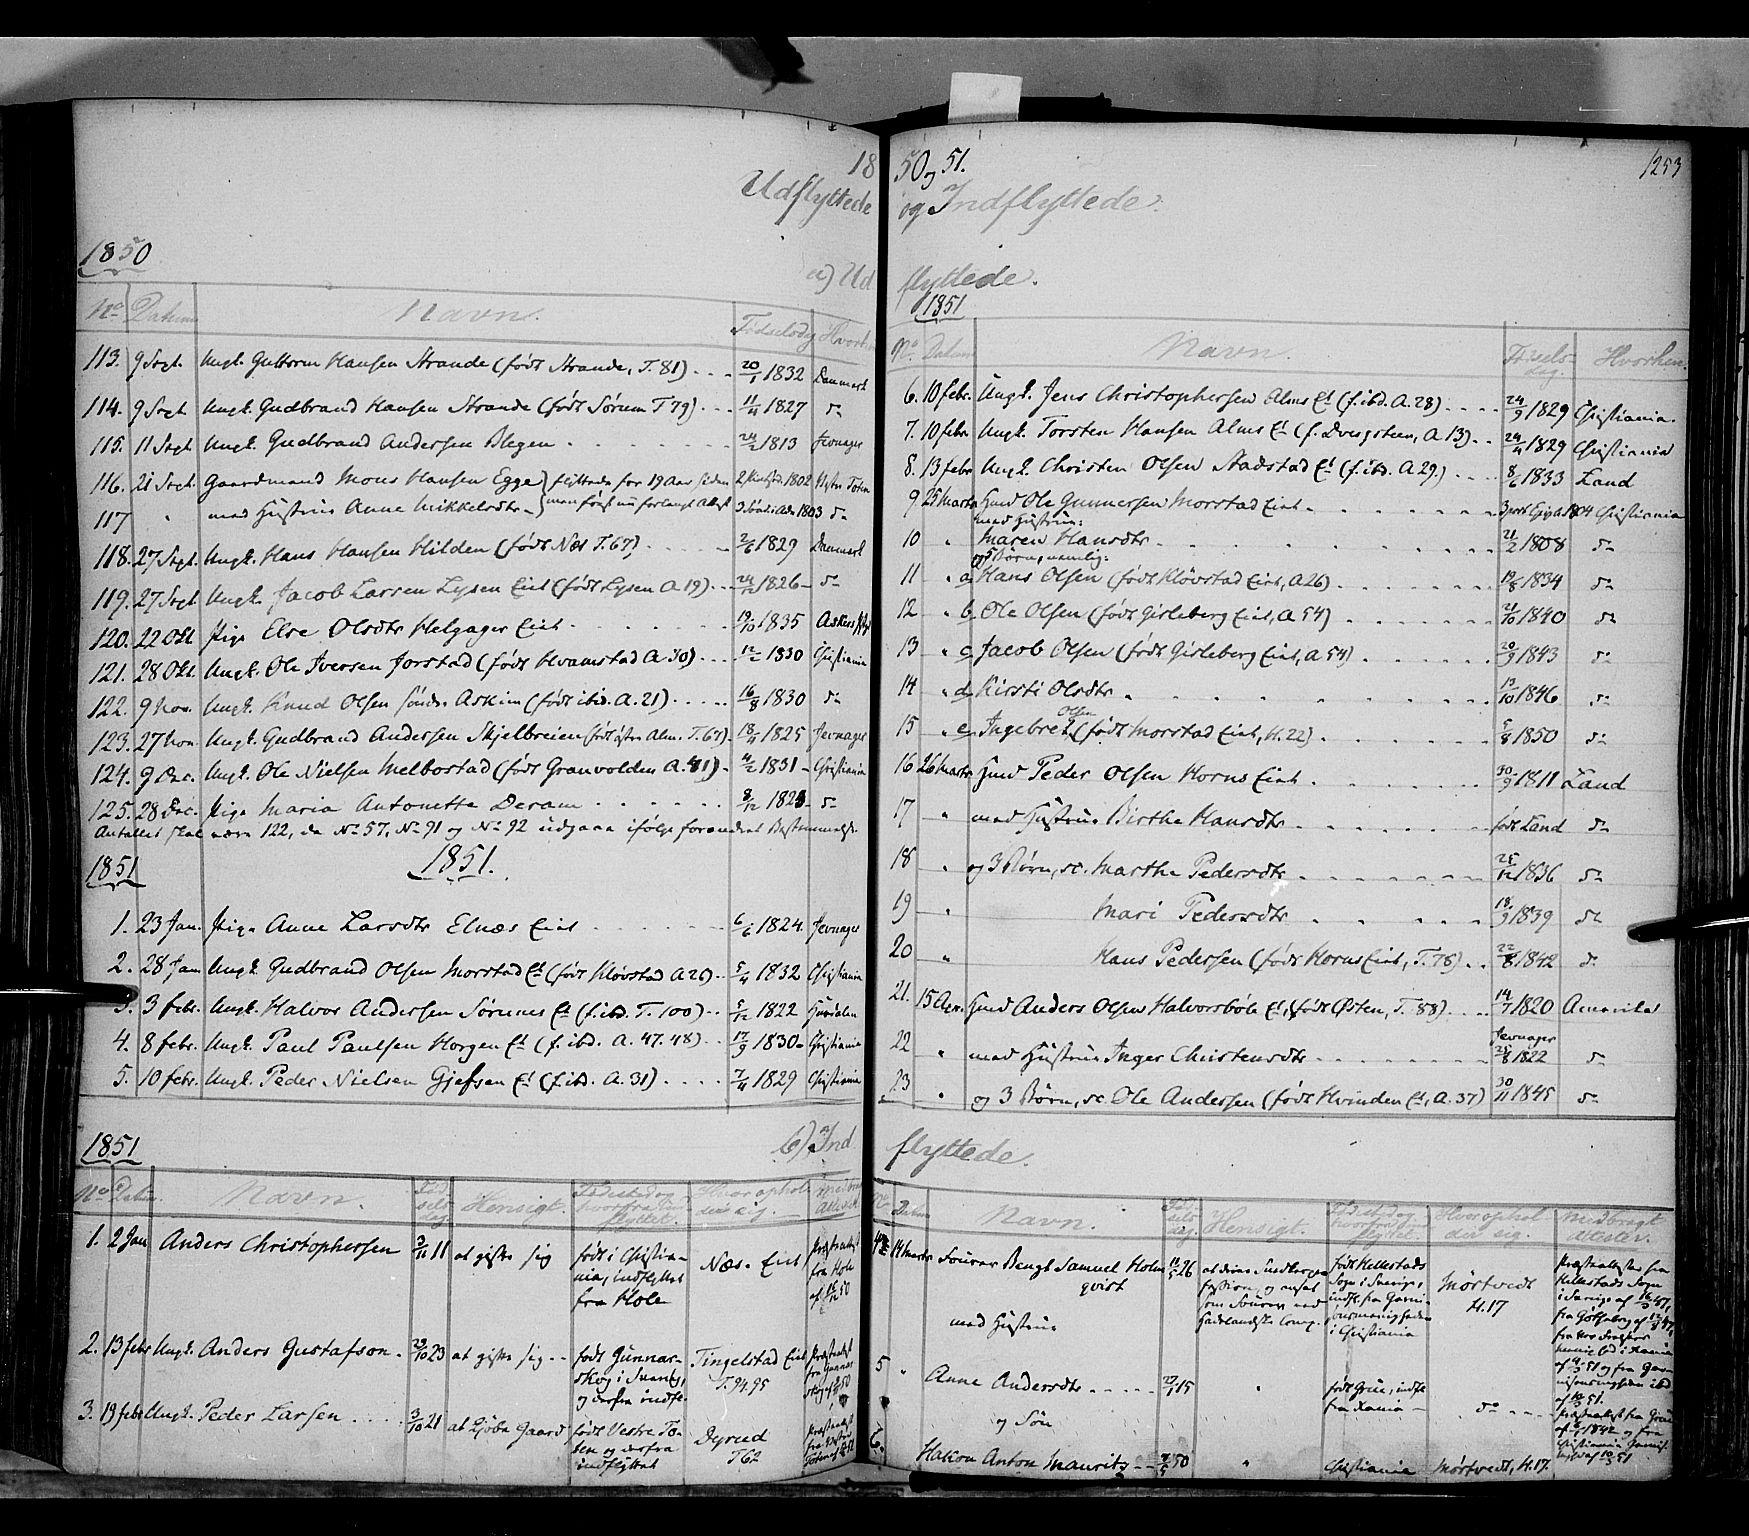 SAH, Gran prestekontor, Ministerialbok nr. 11, 1842-1856, s. 1252-1253